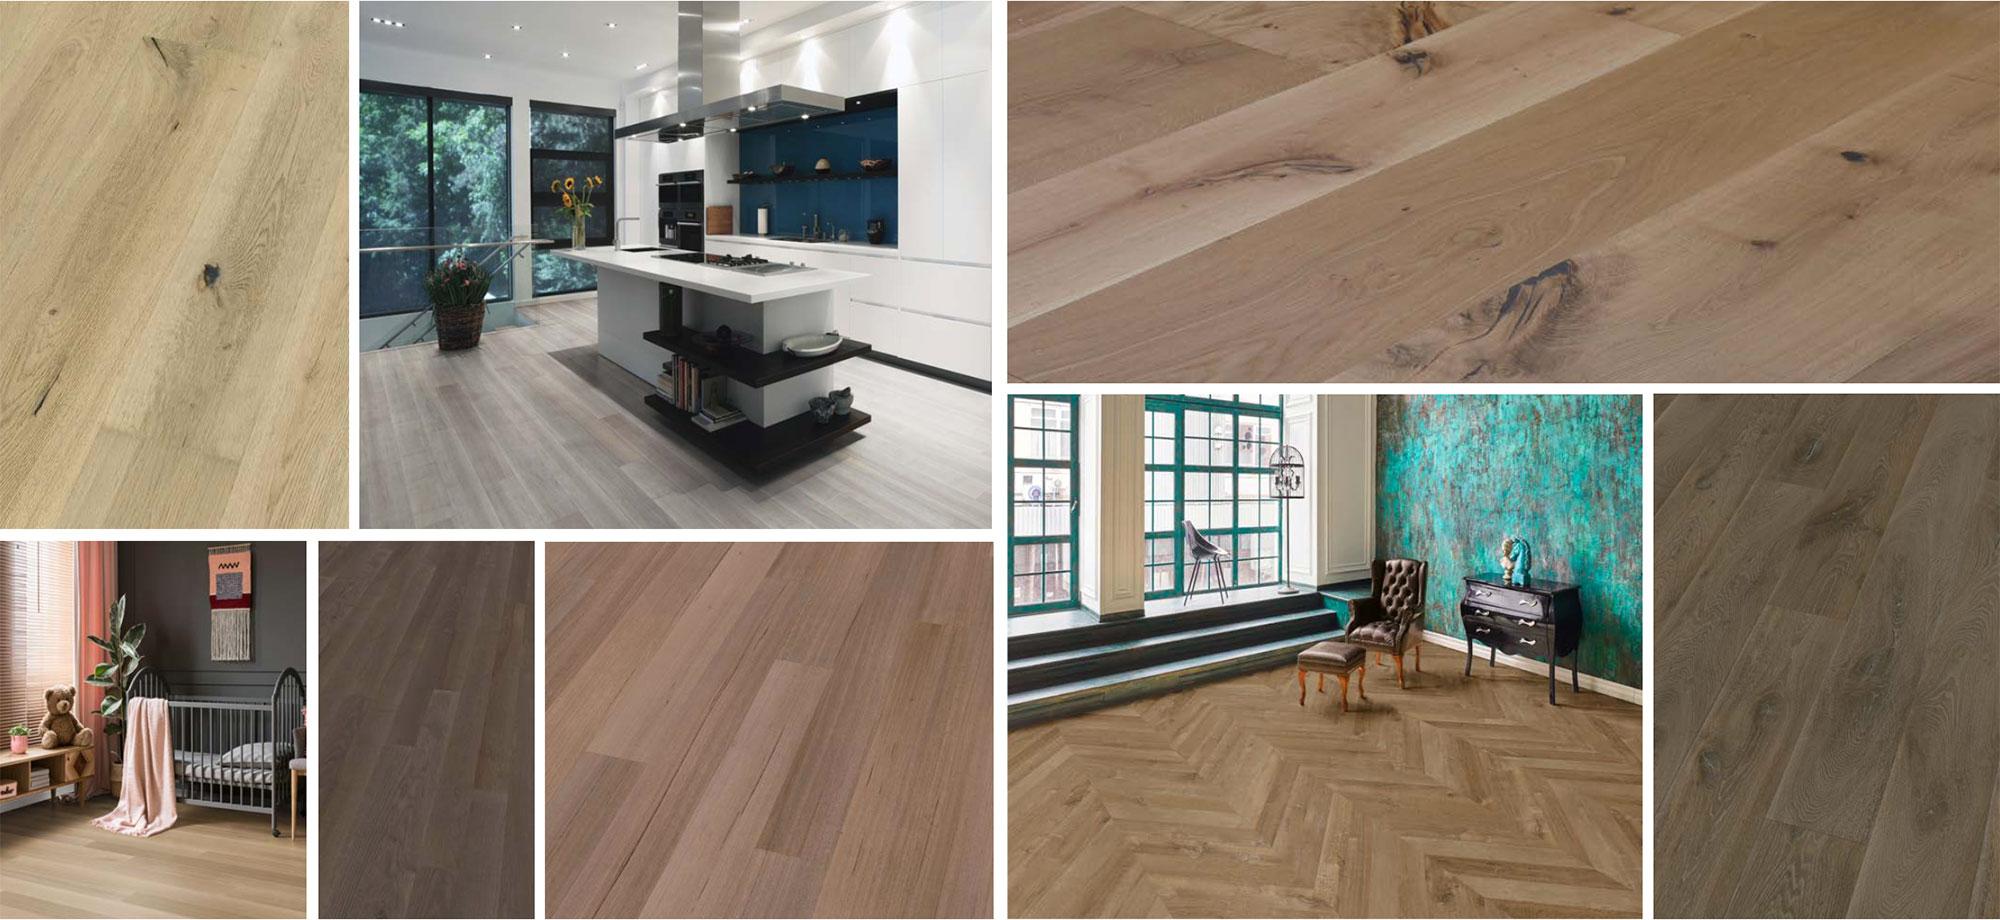 hardwood-floors-forestry-timber